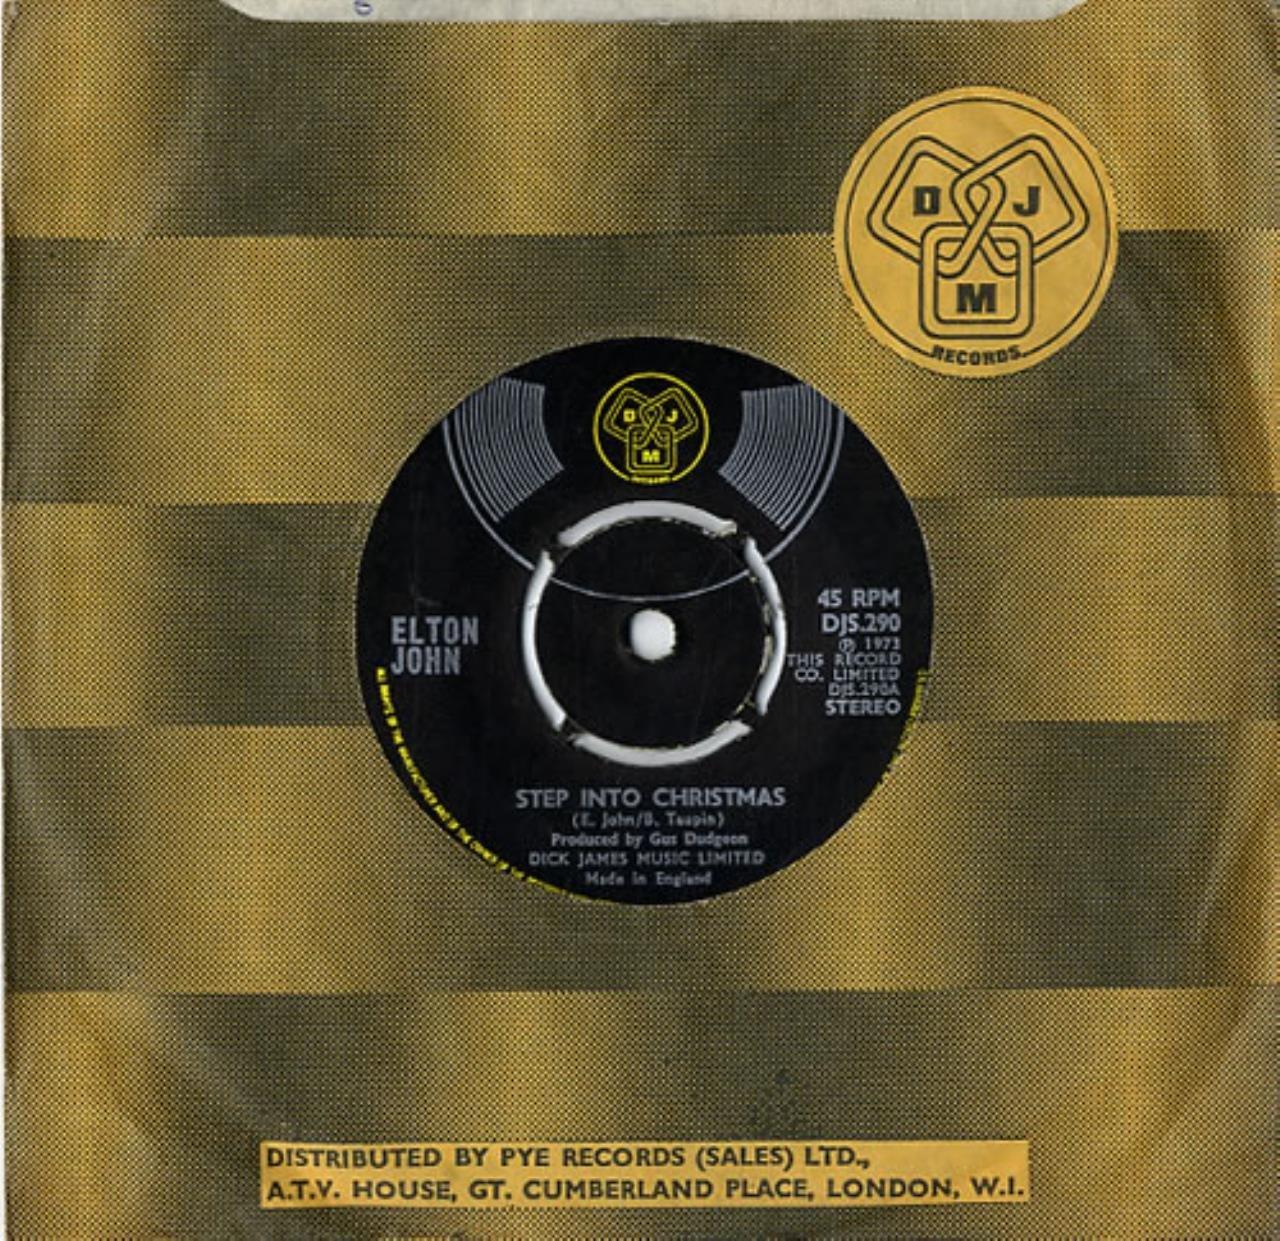 Elton John Step Into Christmas.Elton John Step Into Christmas Translucent Vinyl